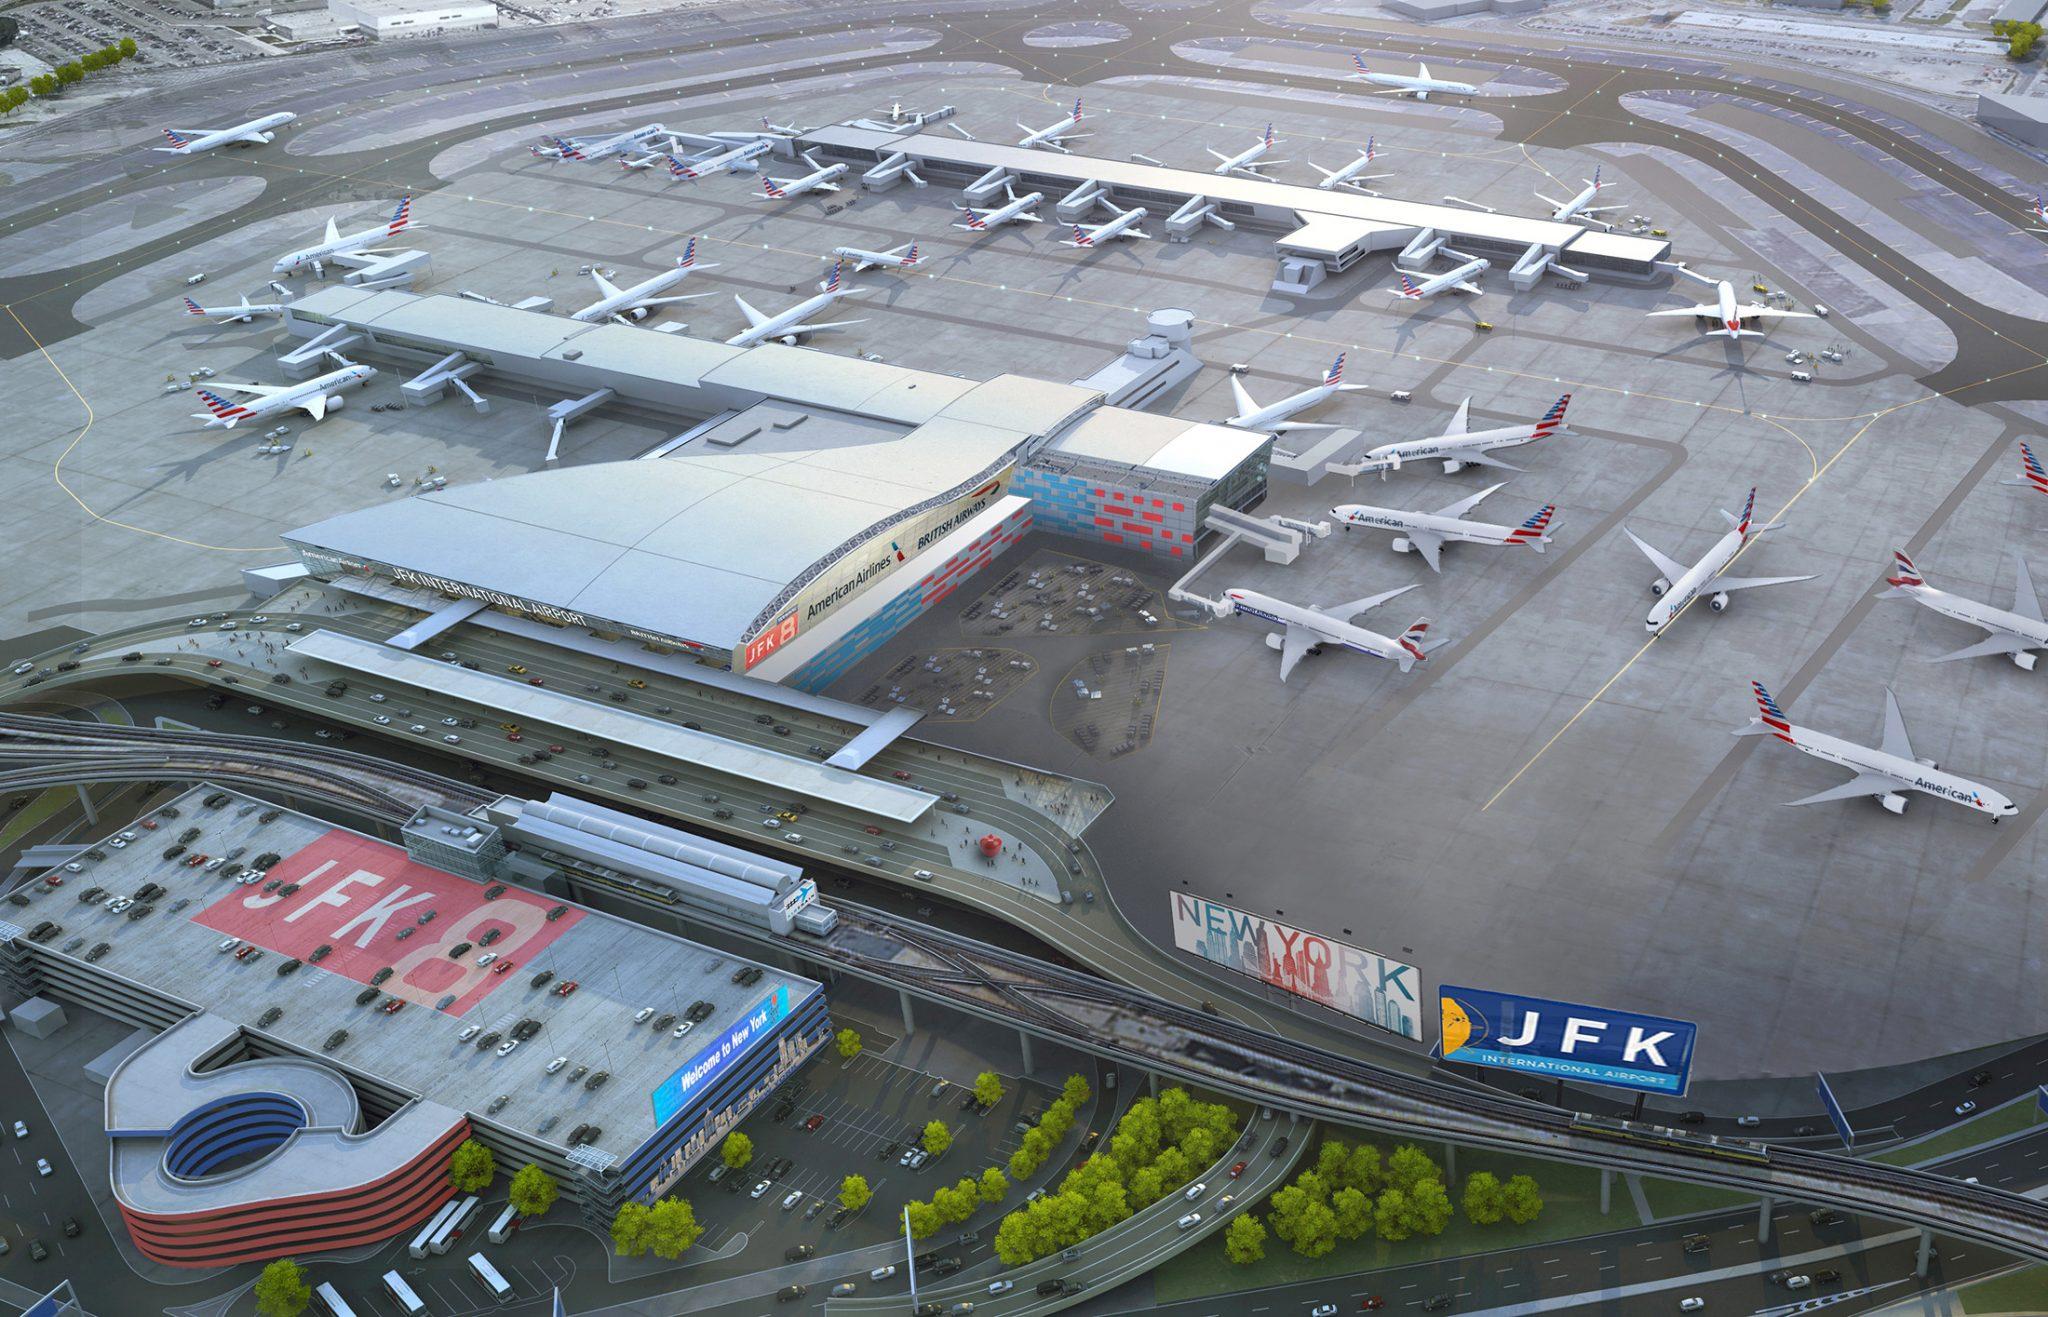 Construction begins on JFK Terminal 8 upgrade